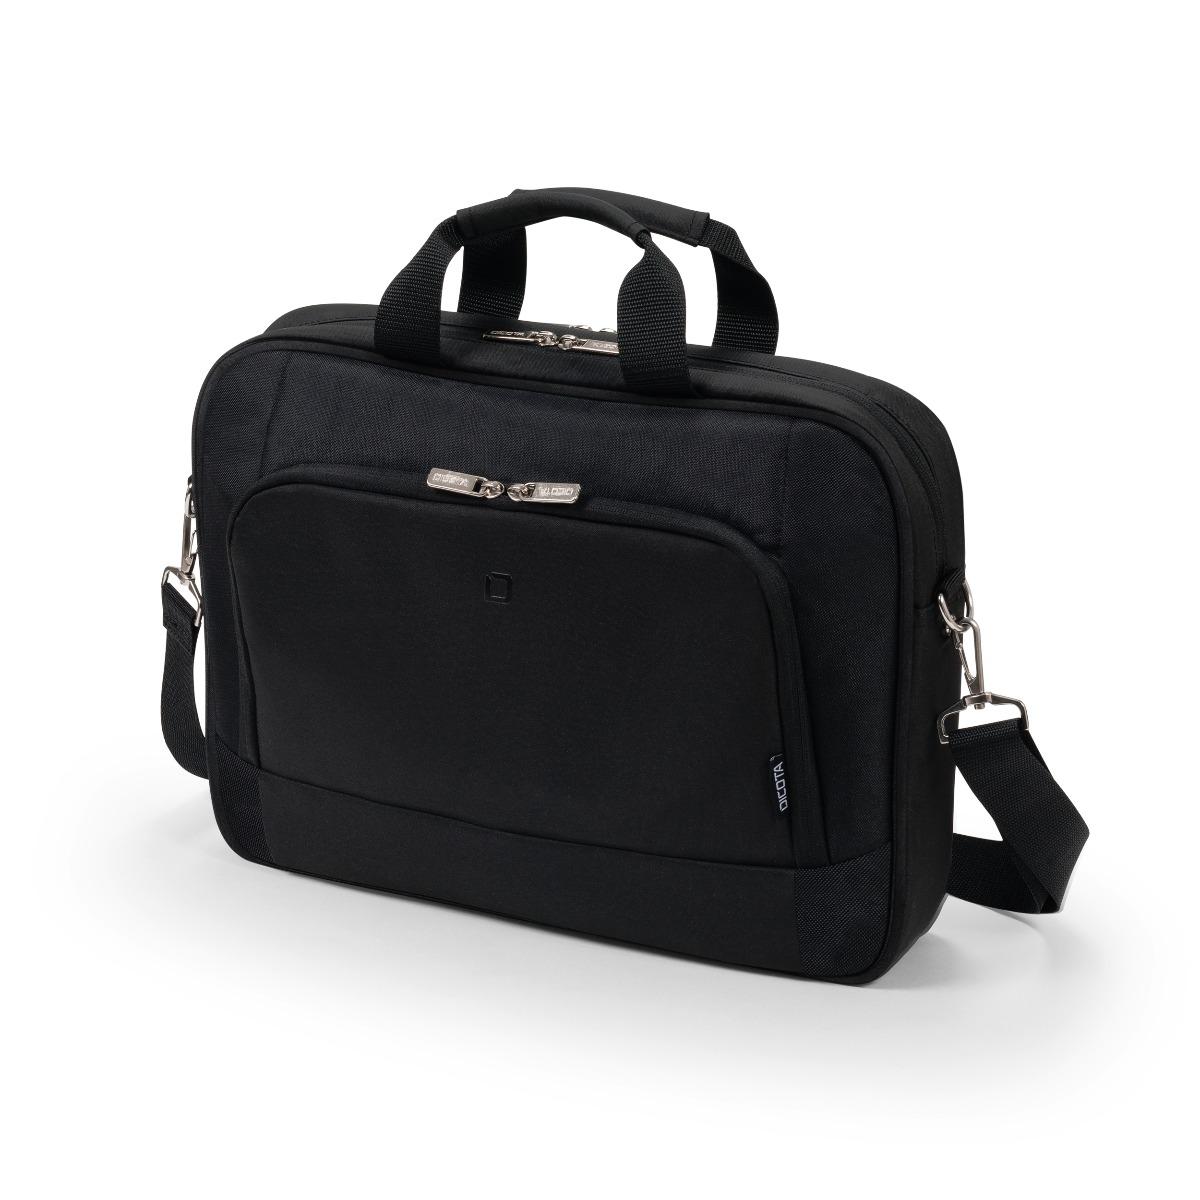 Dicota Top Traveller BASE 15.6 Black notebook case